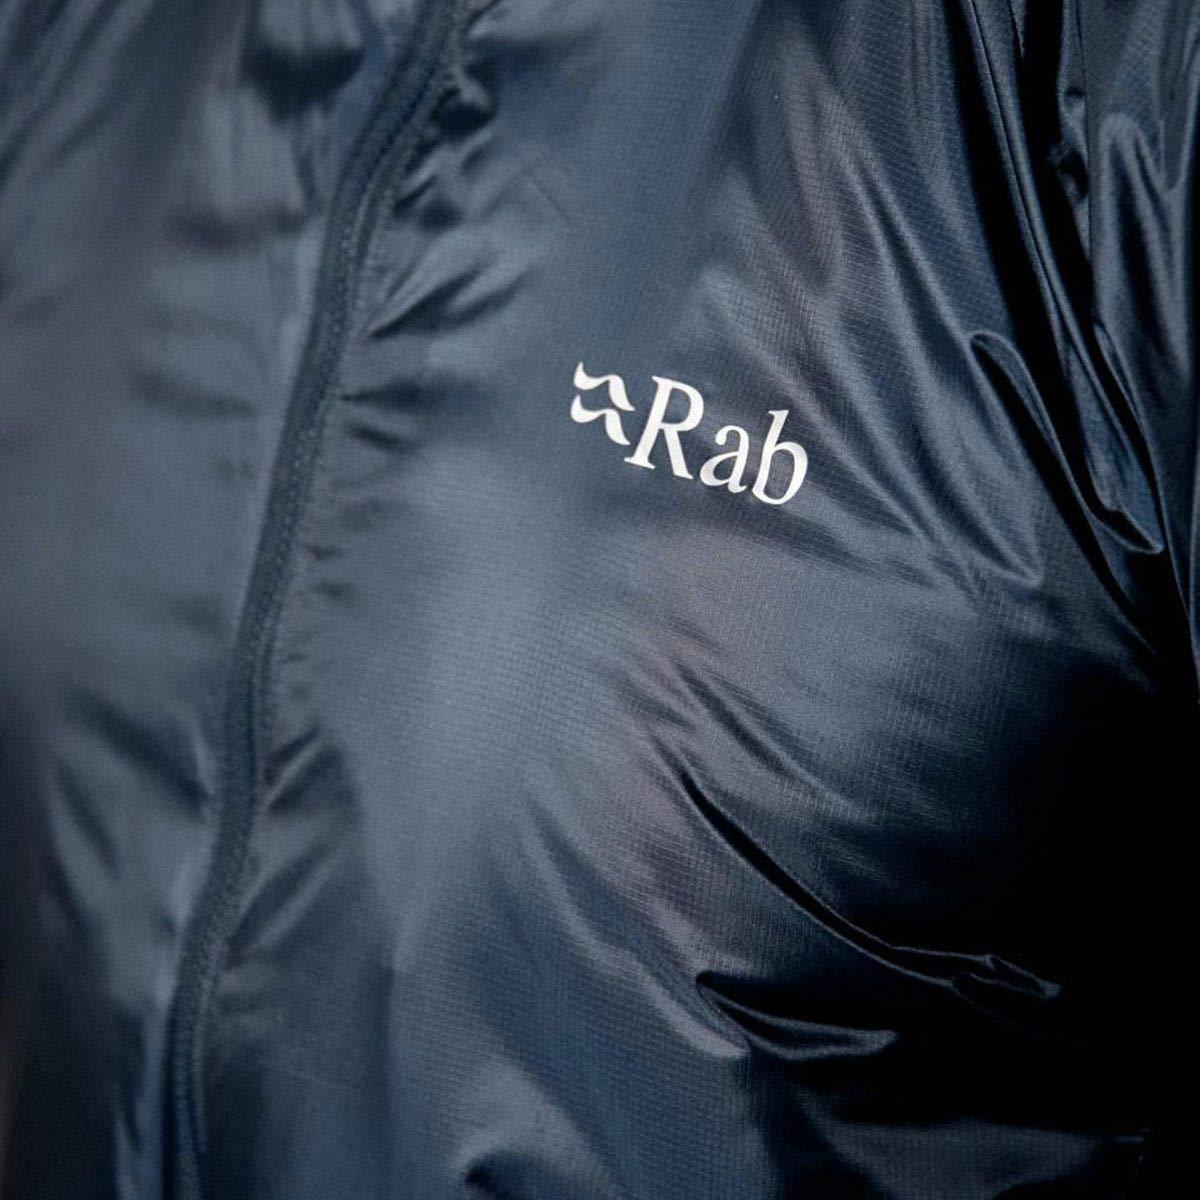 dcb4374d814f70 Amazon.com : RAB Xenon X Jacket - Men's : Clothing